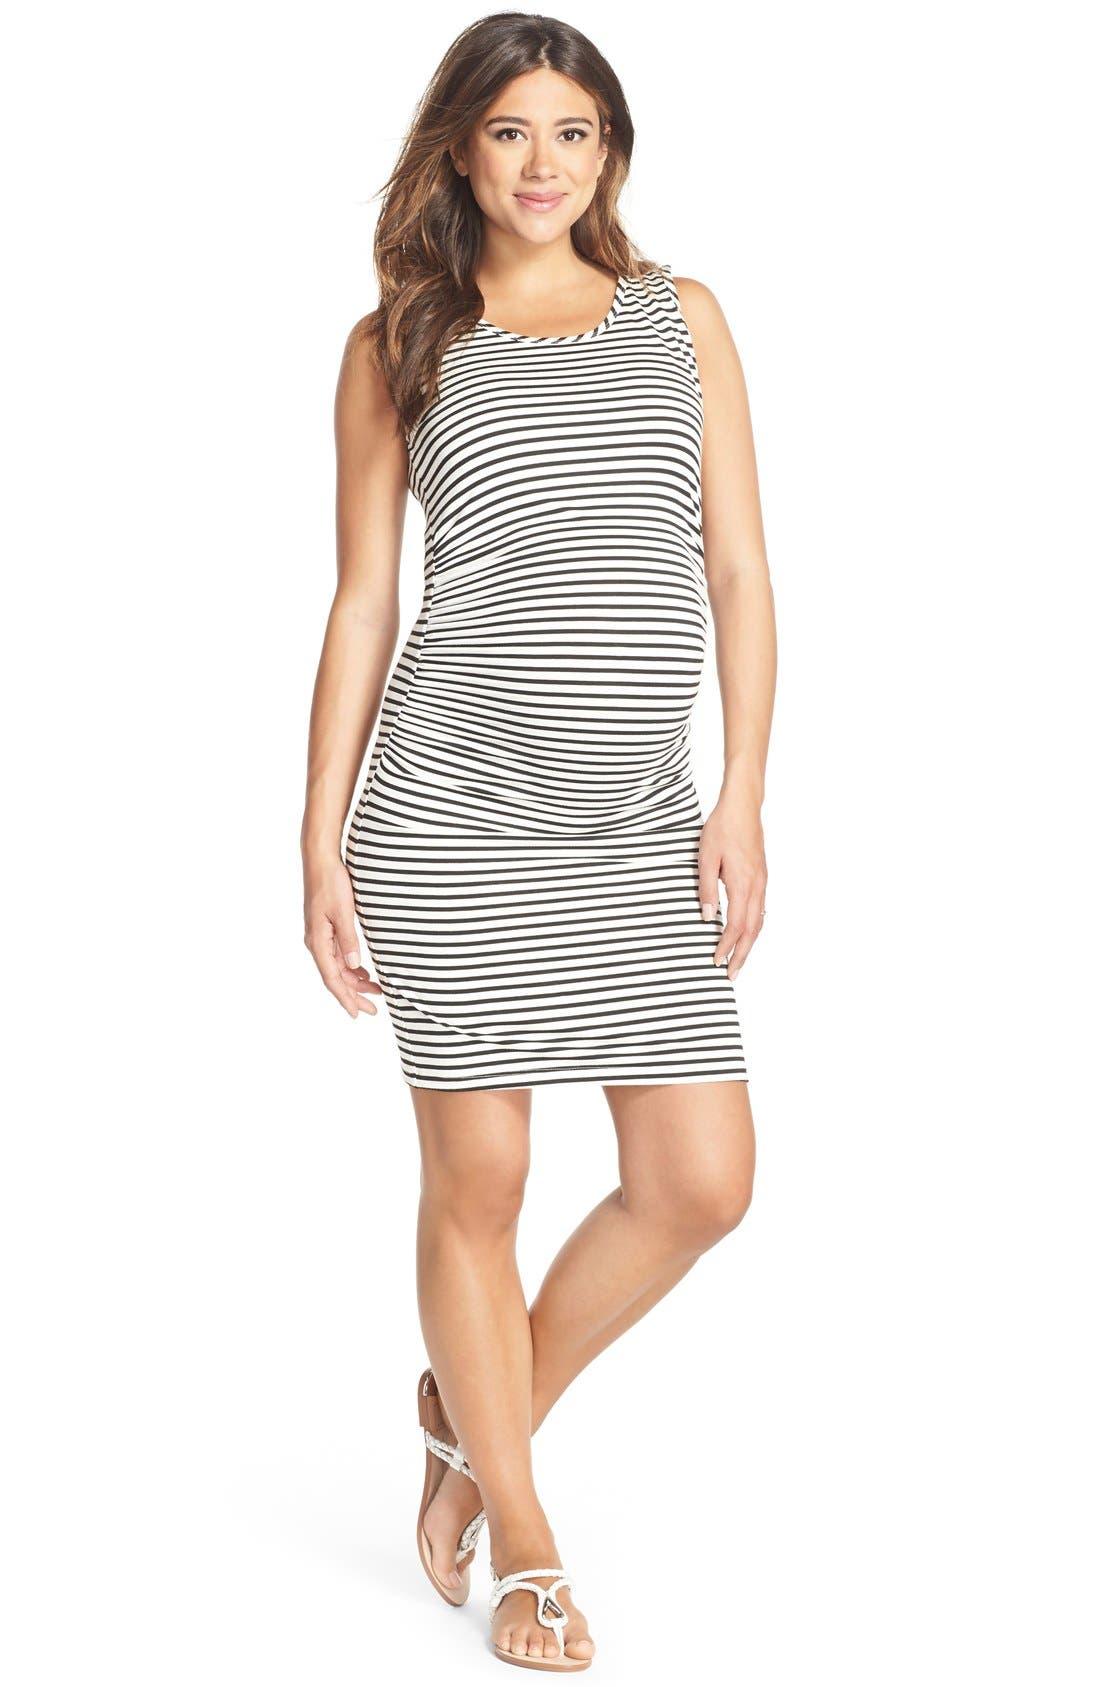 LAB40 Maternity/Nursing Tank Dress